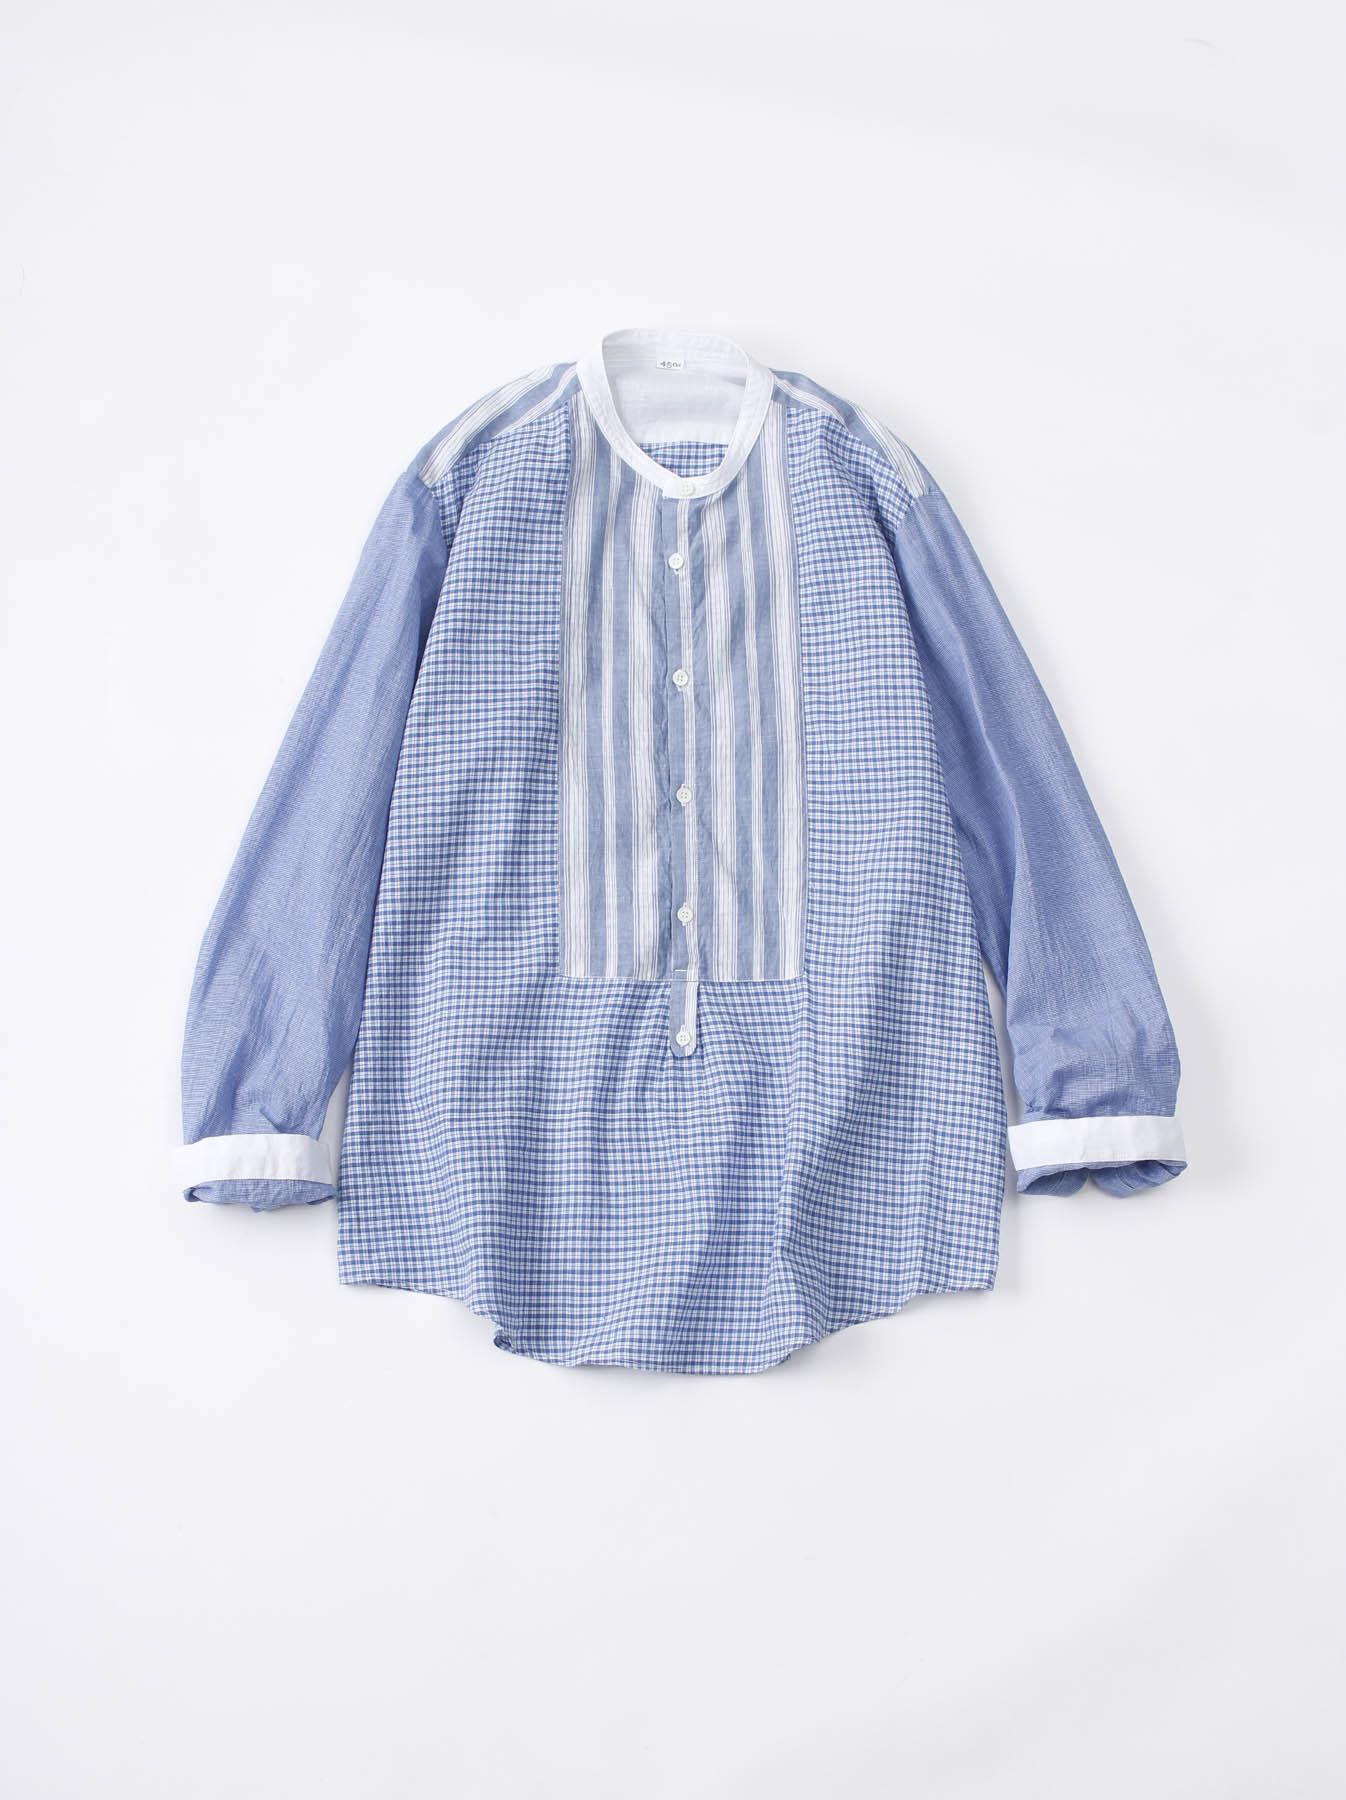 WH Mix Ai-kaze Khadi Pullover Shirt-1